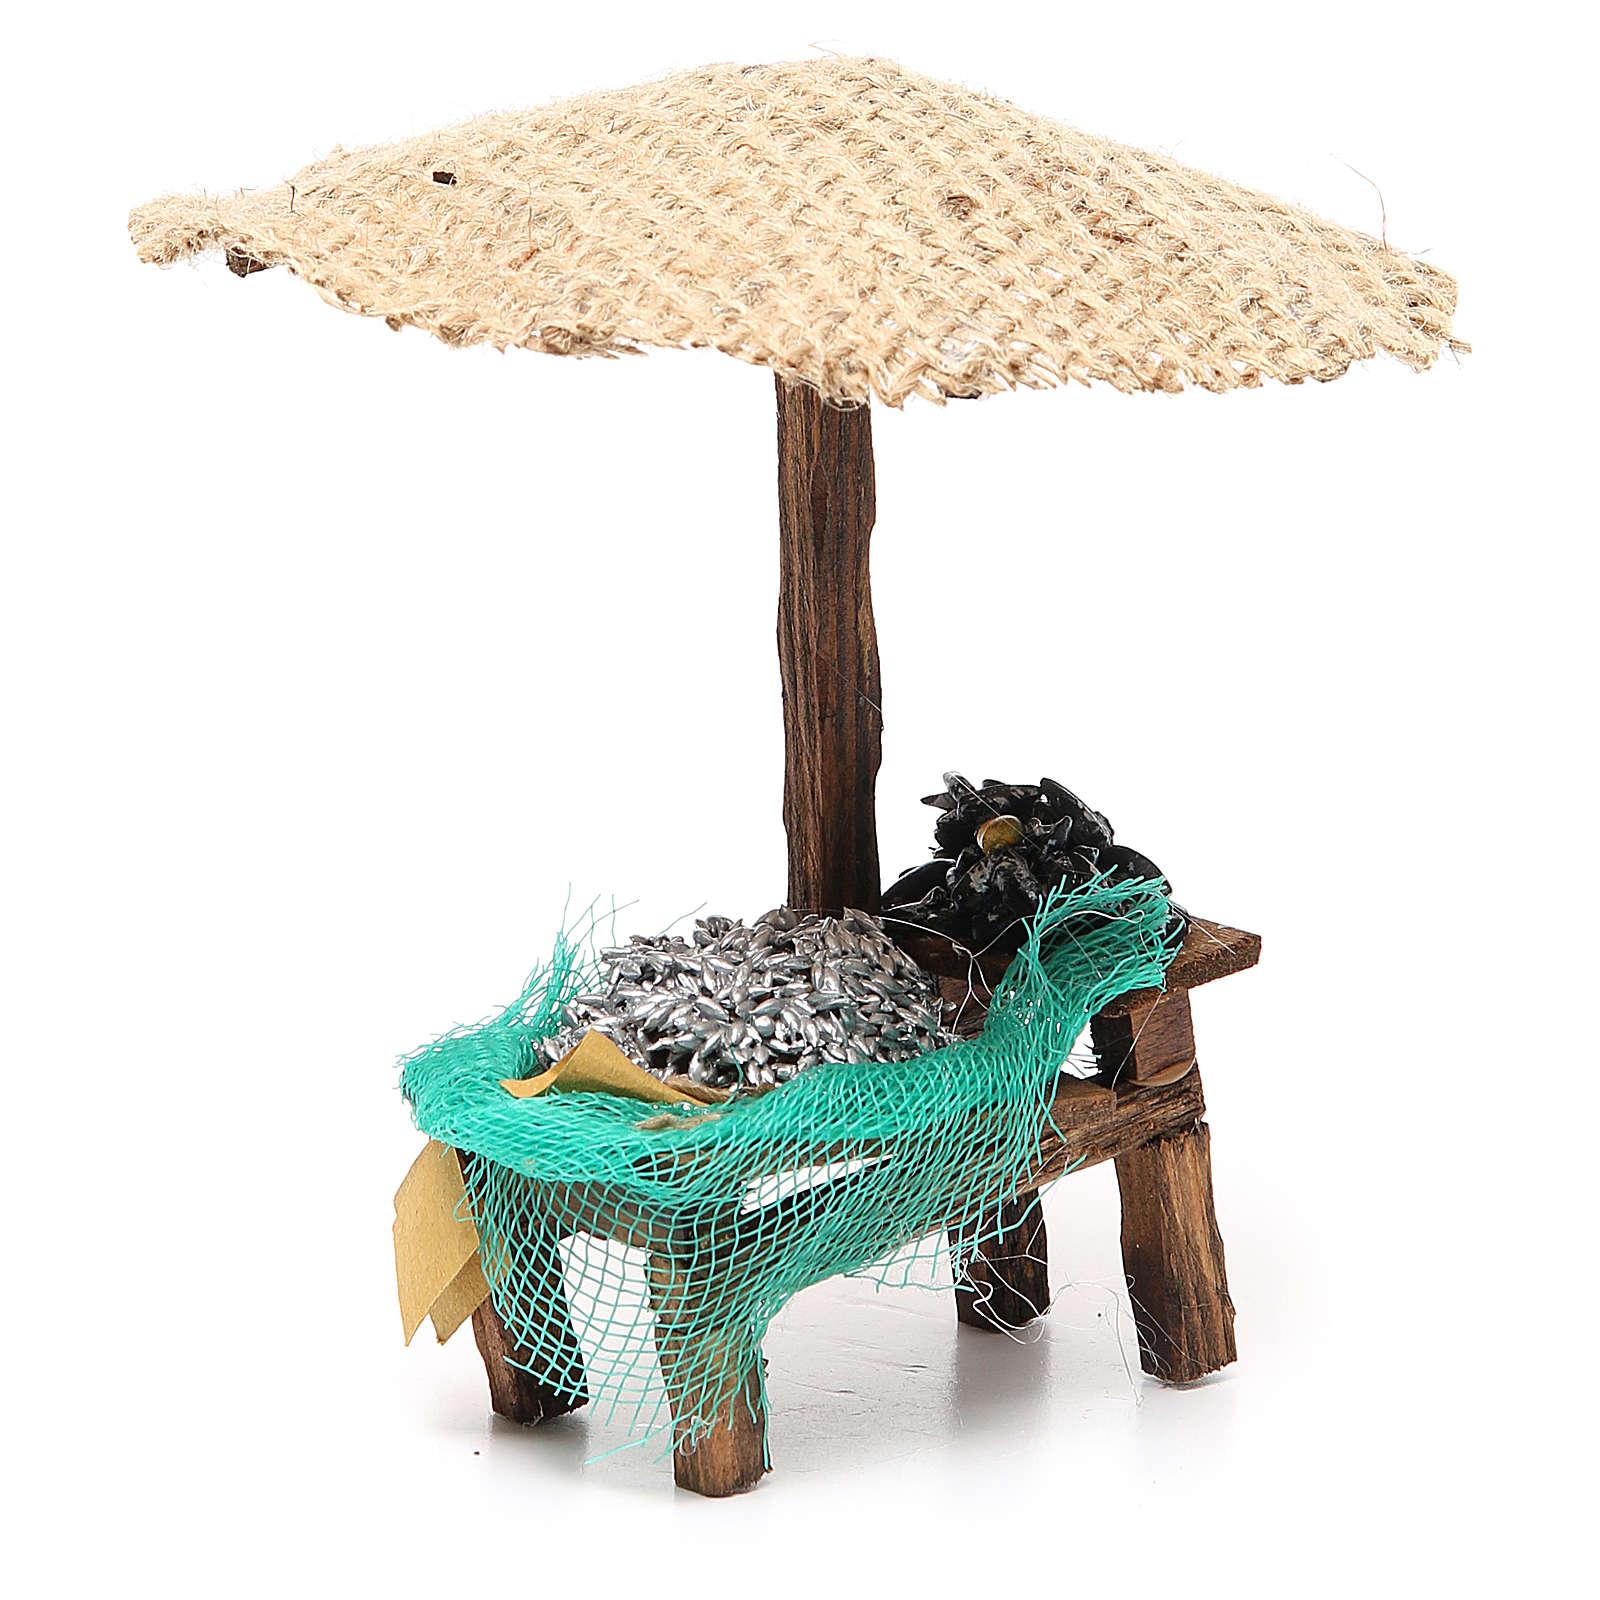 Banchetto presepe con ombrello sardine cozze 16x10x12 cm 4